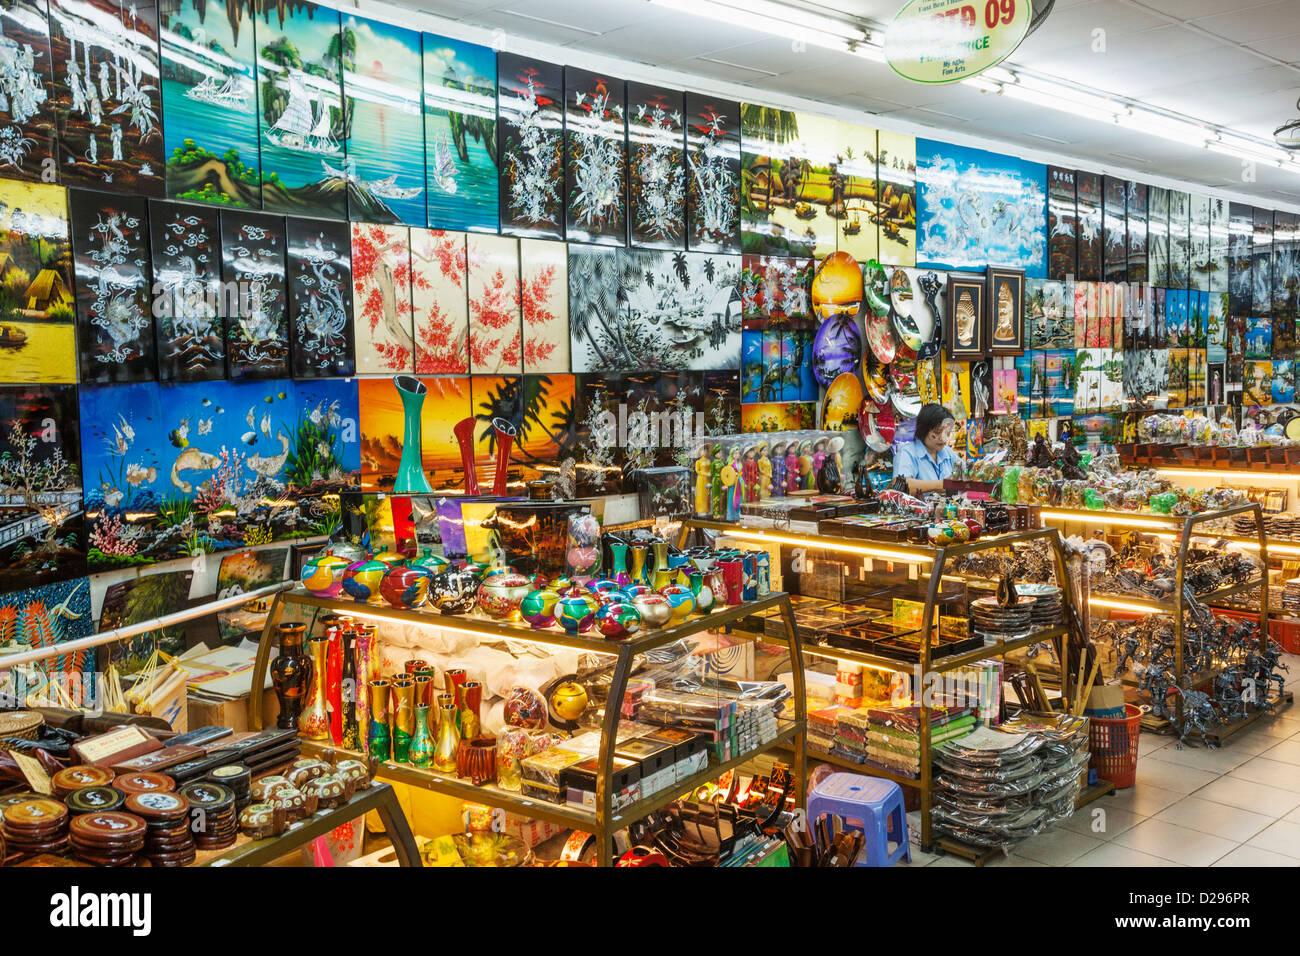 Vietnam Ho Chi Minh City Ben Thanh Market Handicraft Souvenir